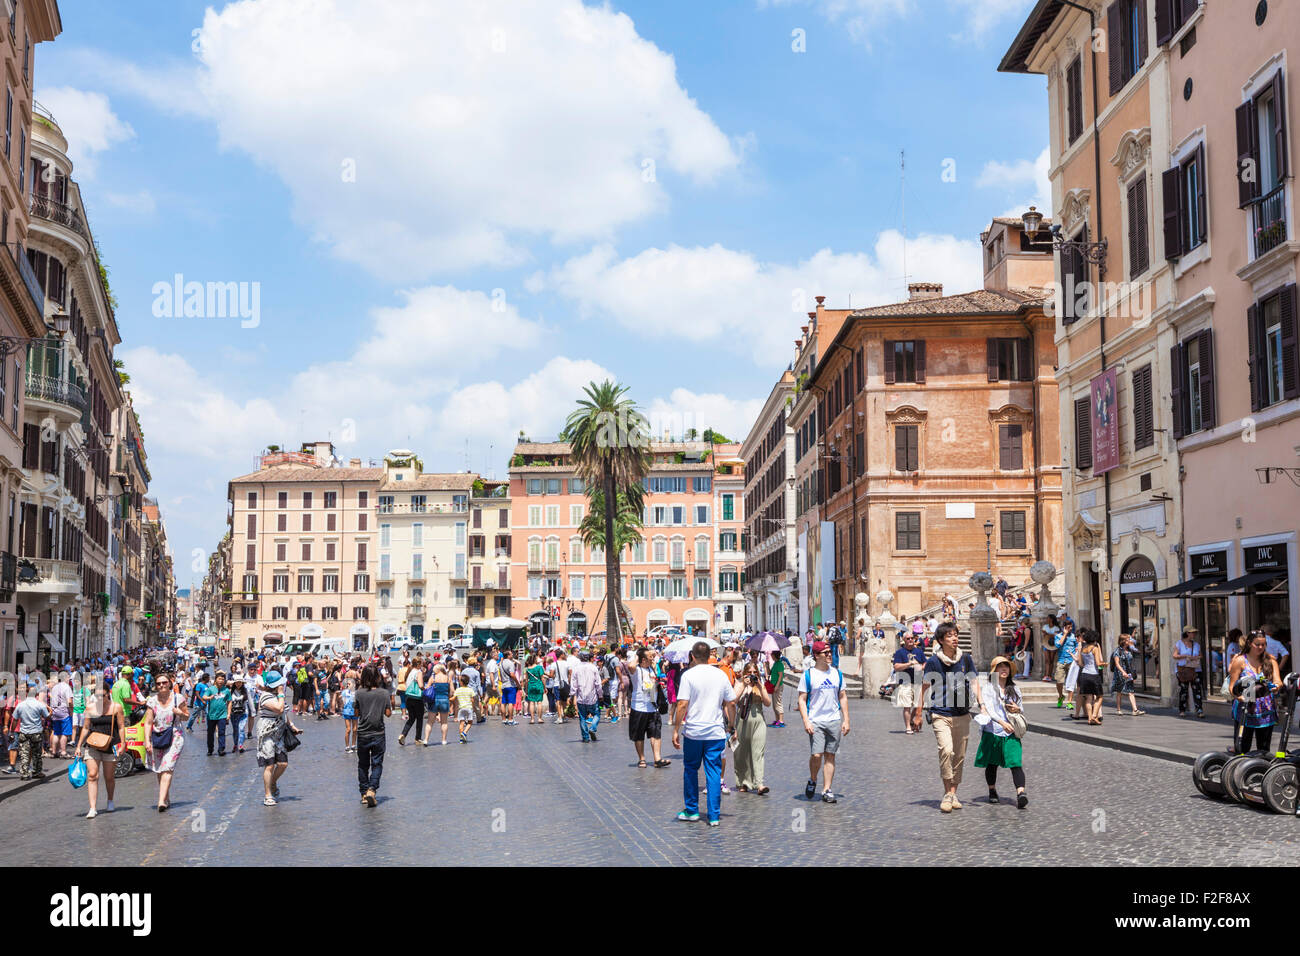 Tourists gathered in the  Piazza di spagna Roma Rome lazio Italy EU Europe - Stock Image